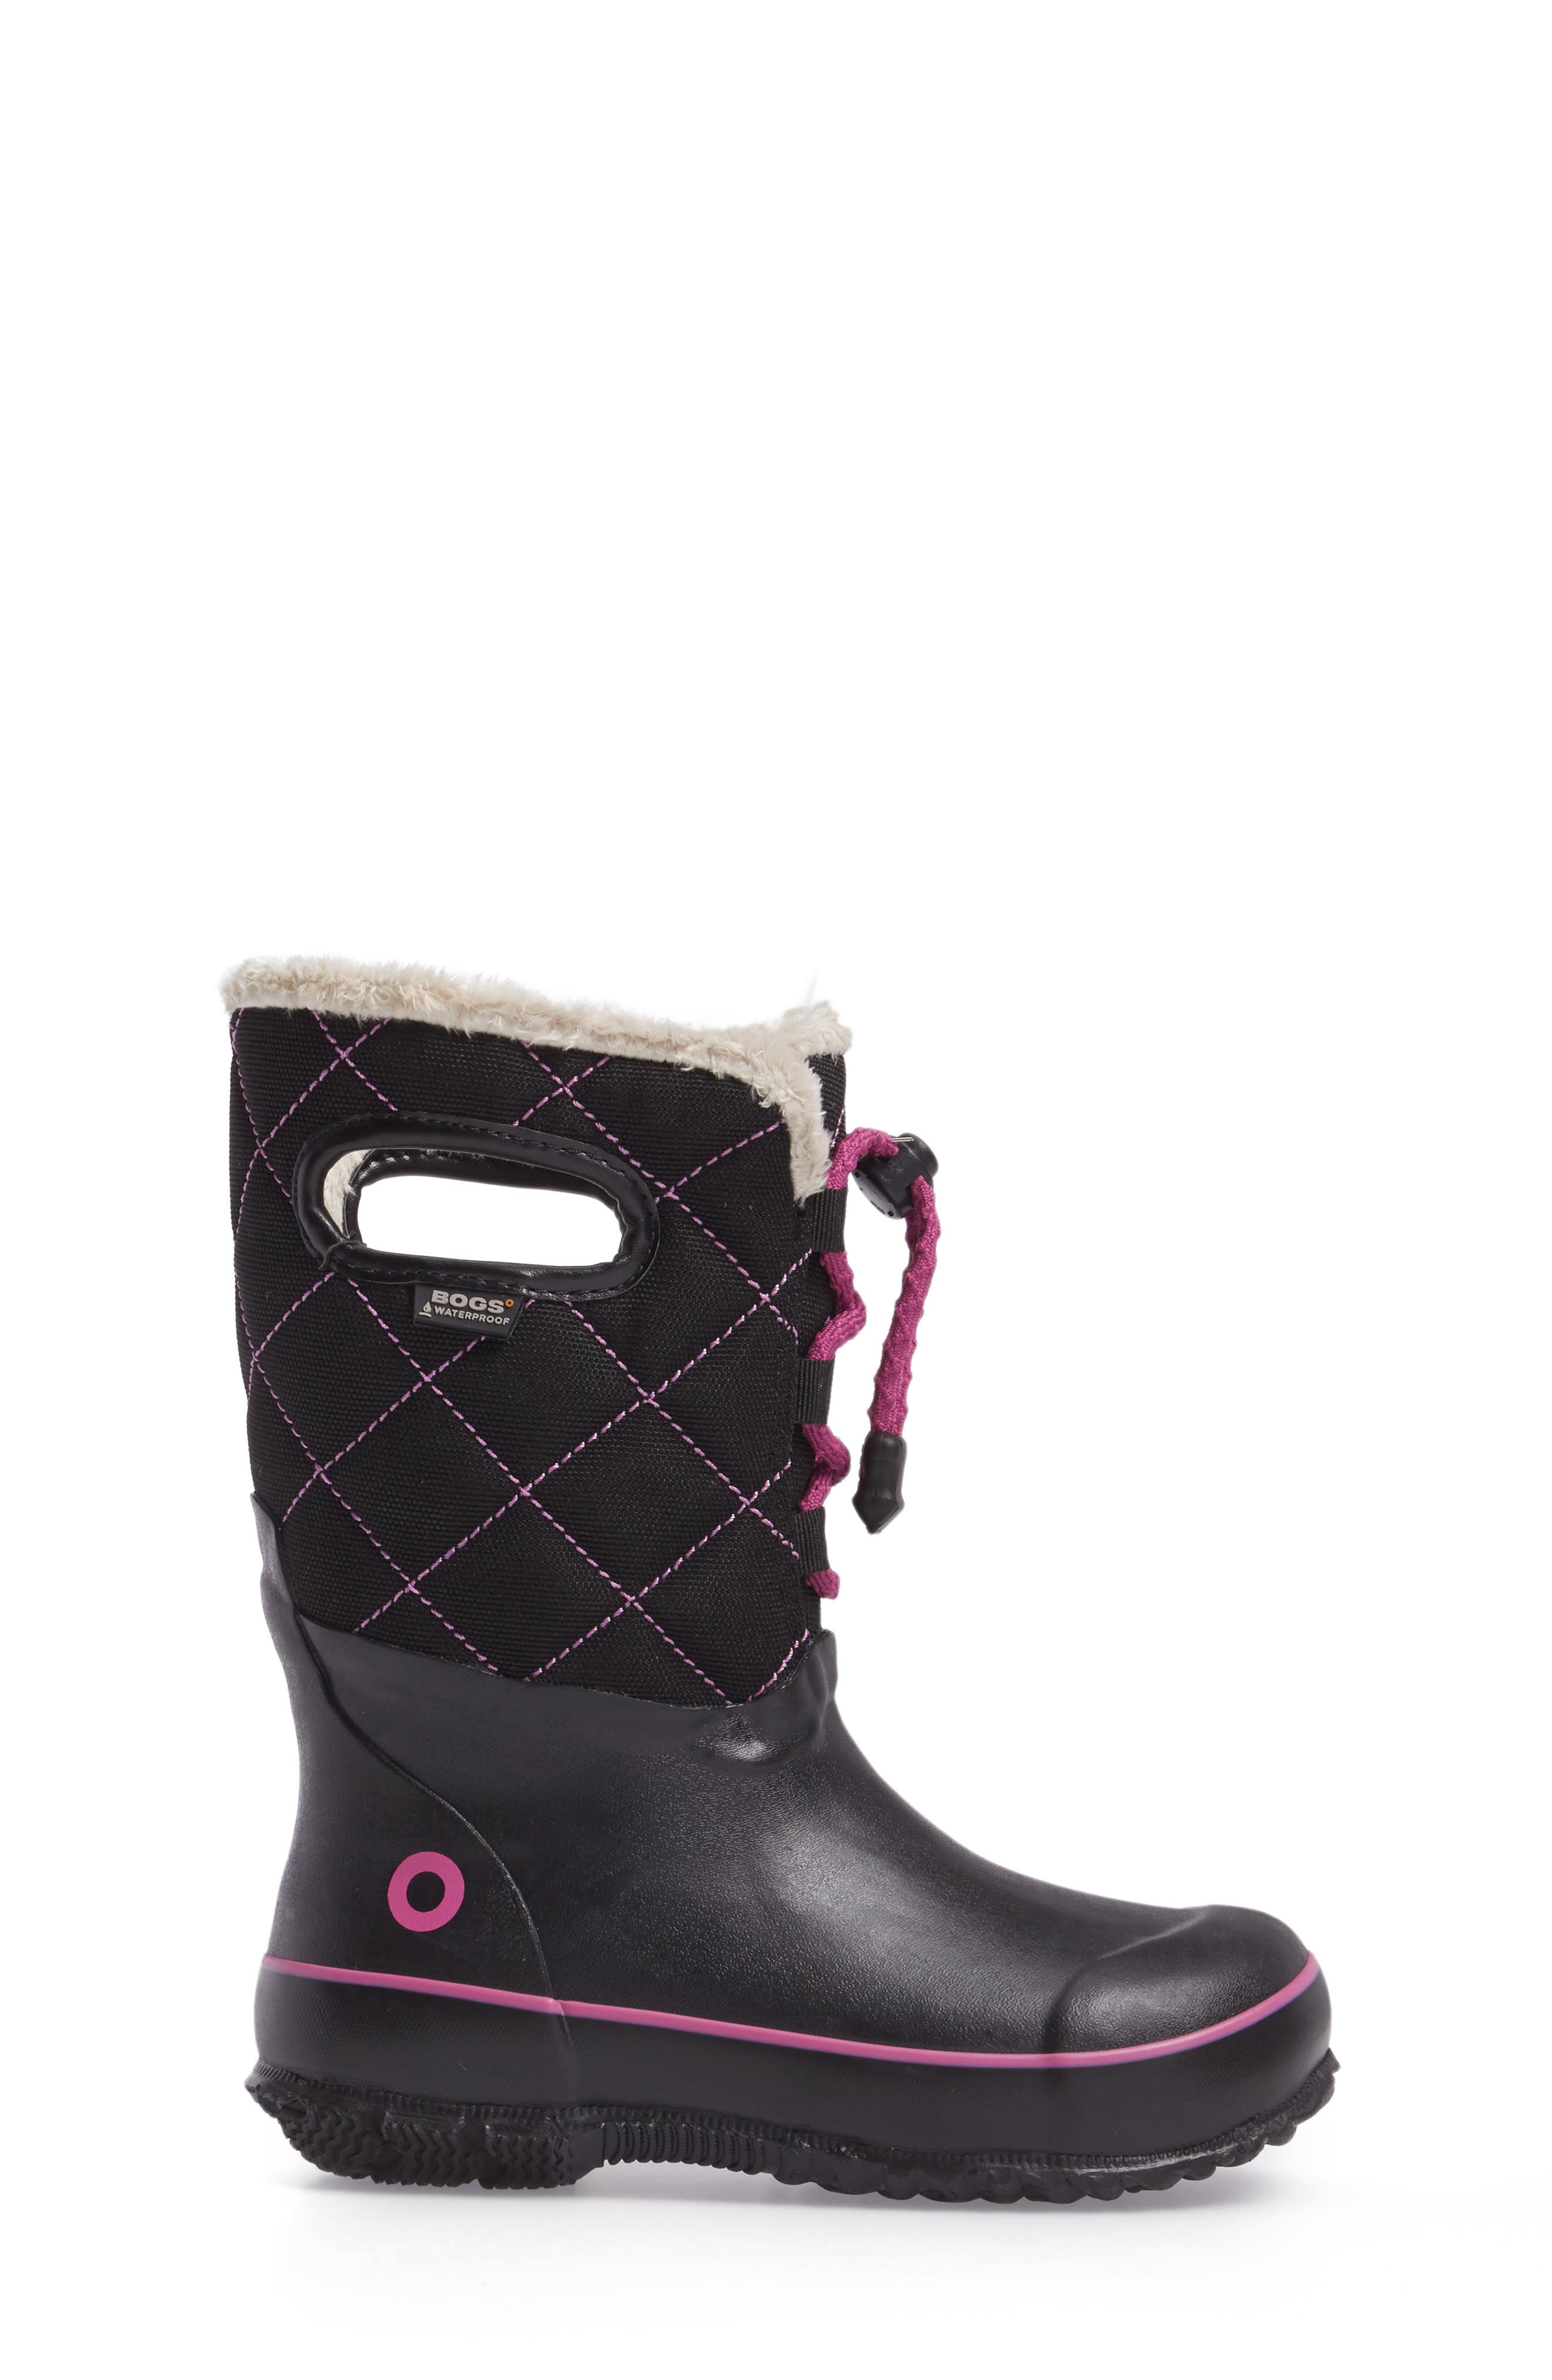 Juno Faux Fur Insulated Waterproof Boot,                             Alternate thumbnail 3, color,                             Black Multi